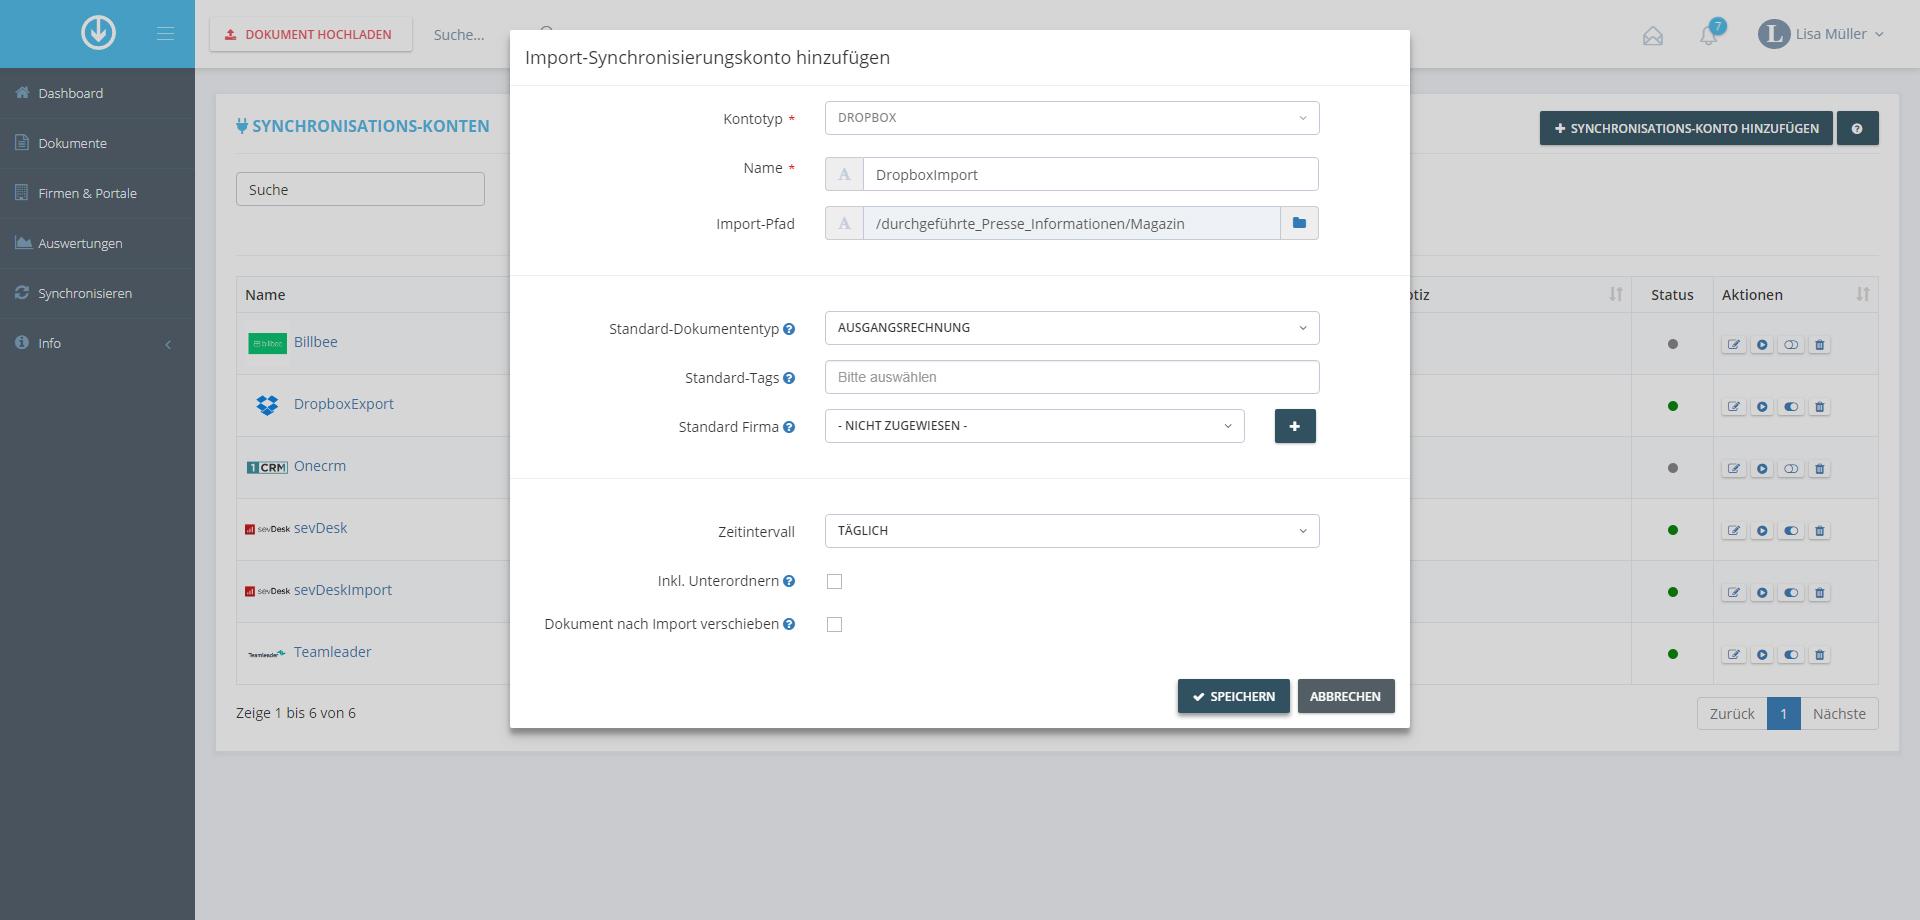 3. Document Import: Add Import-Synchronization Account